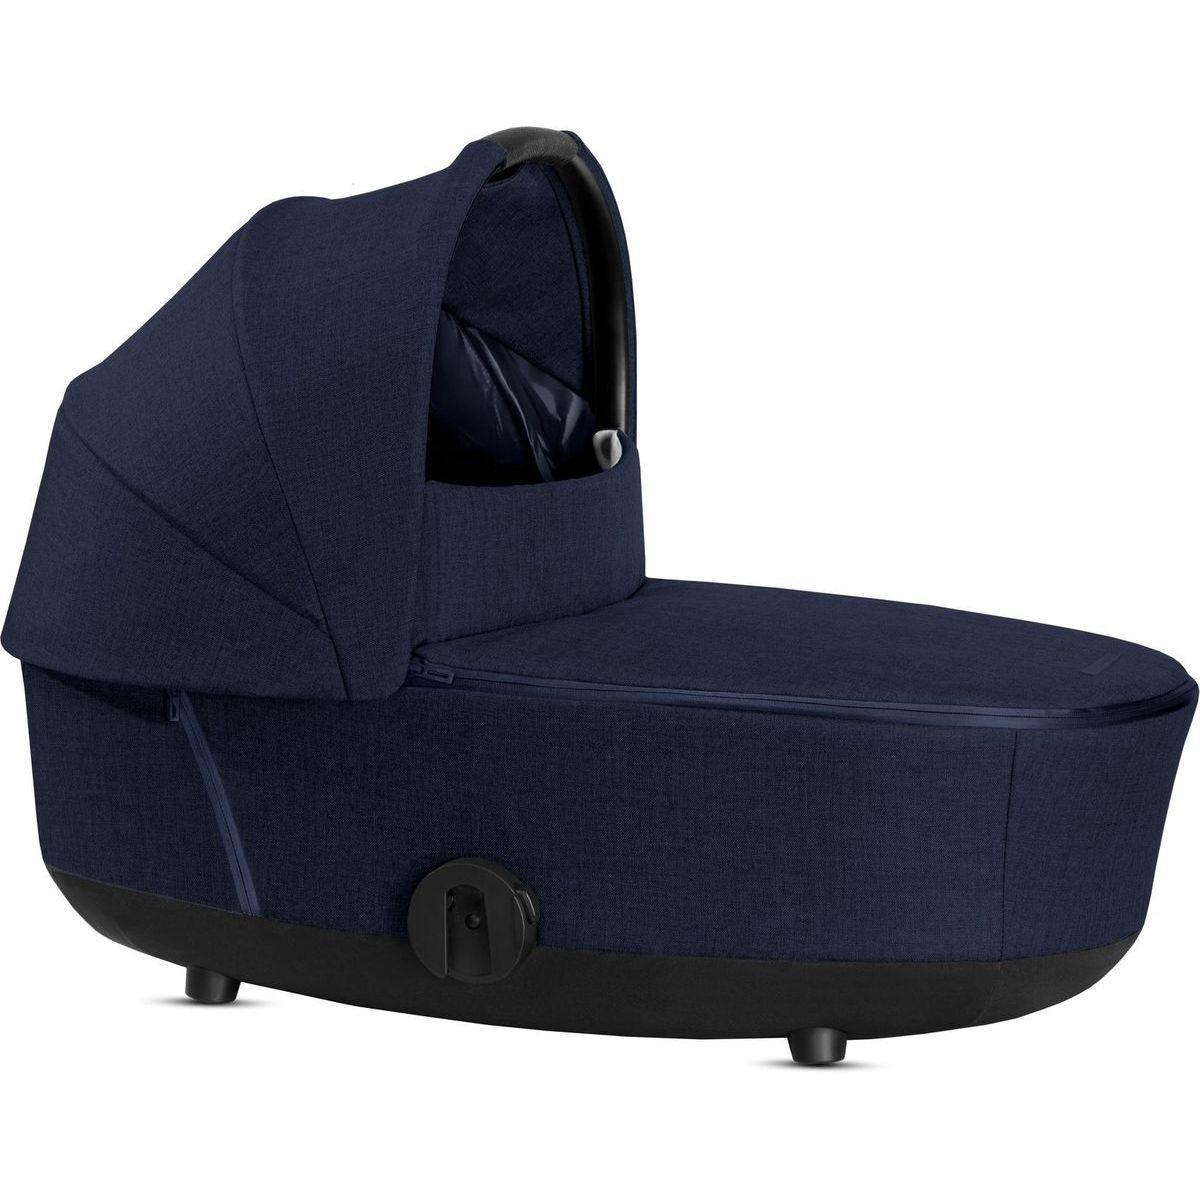 Capazo de luxe MIOS Cybex Plus Midnight Blue Plus-navy blue